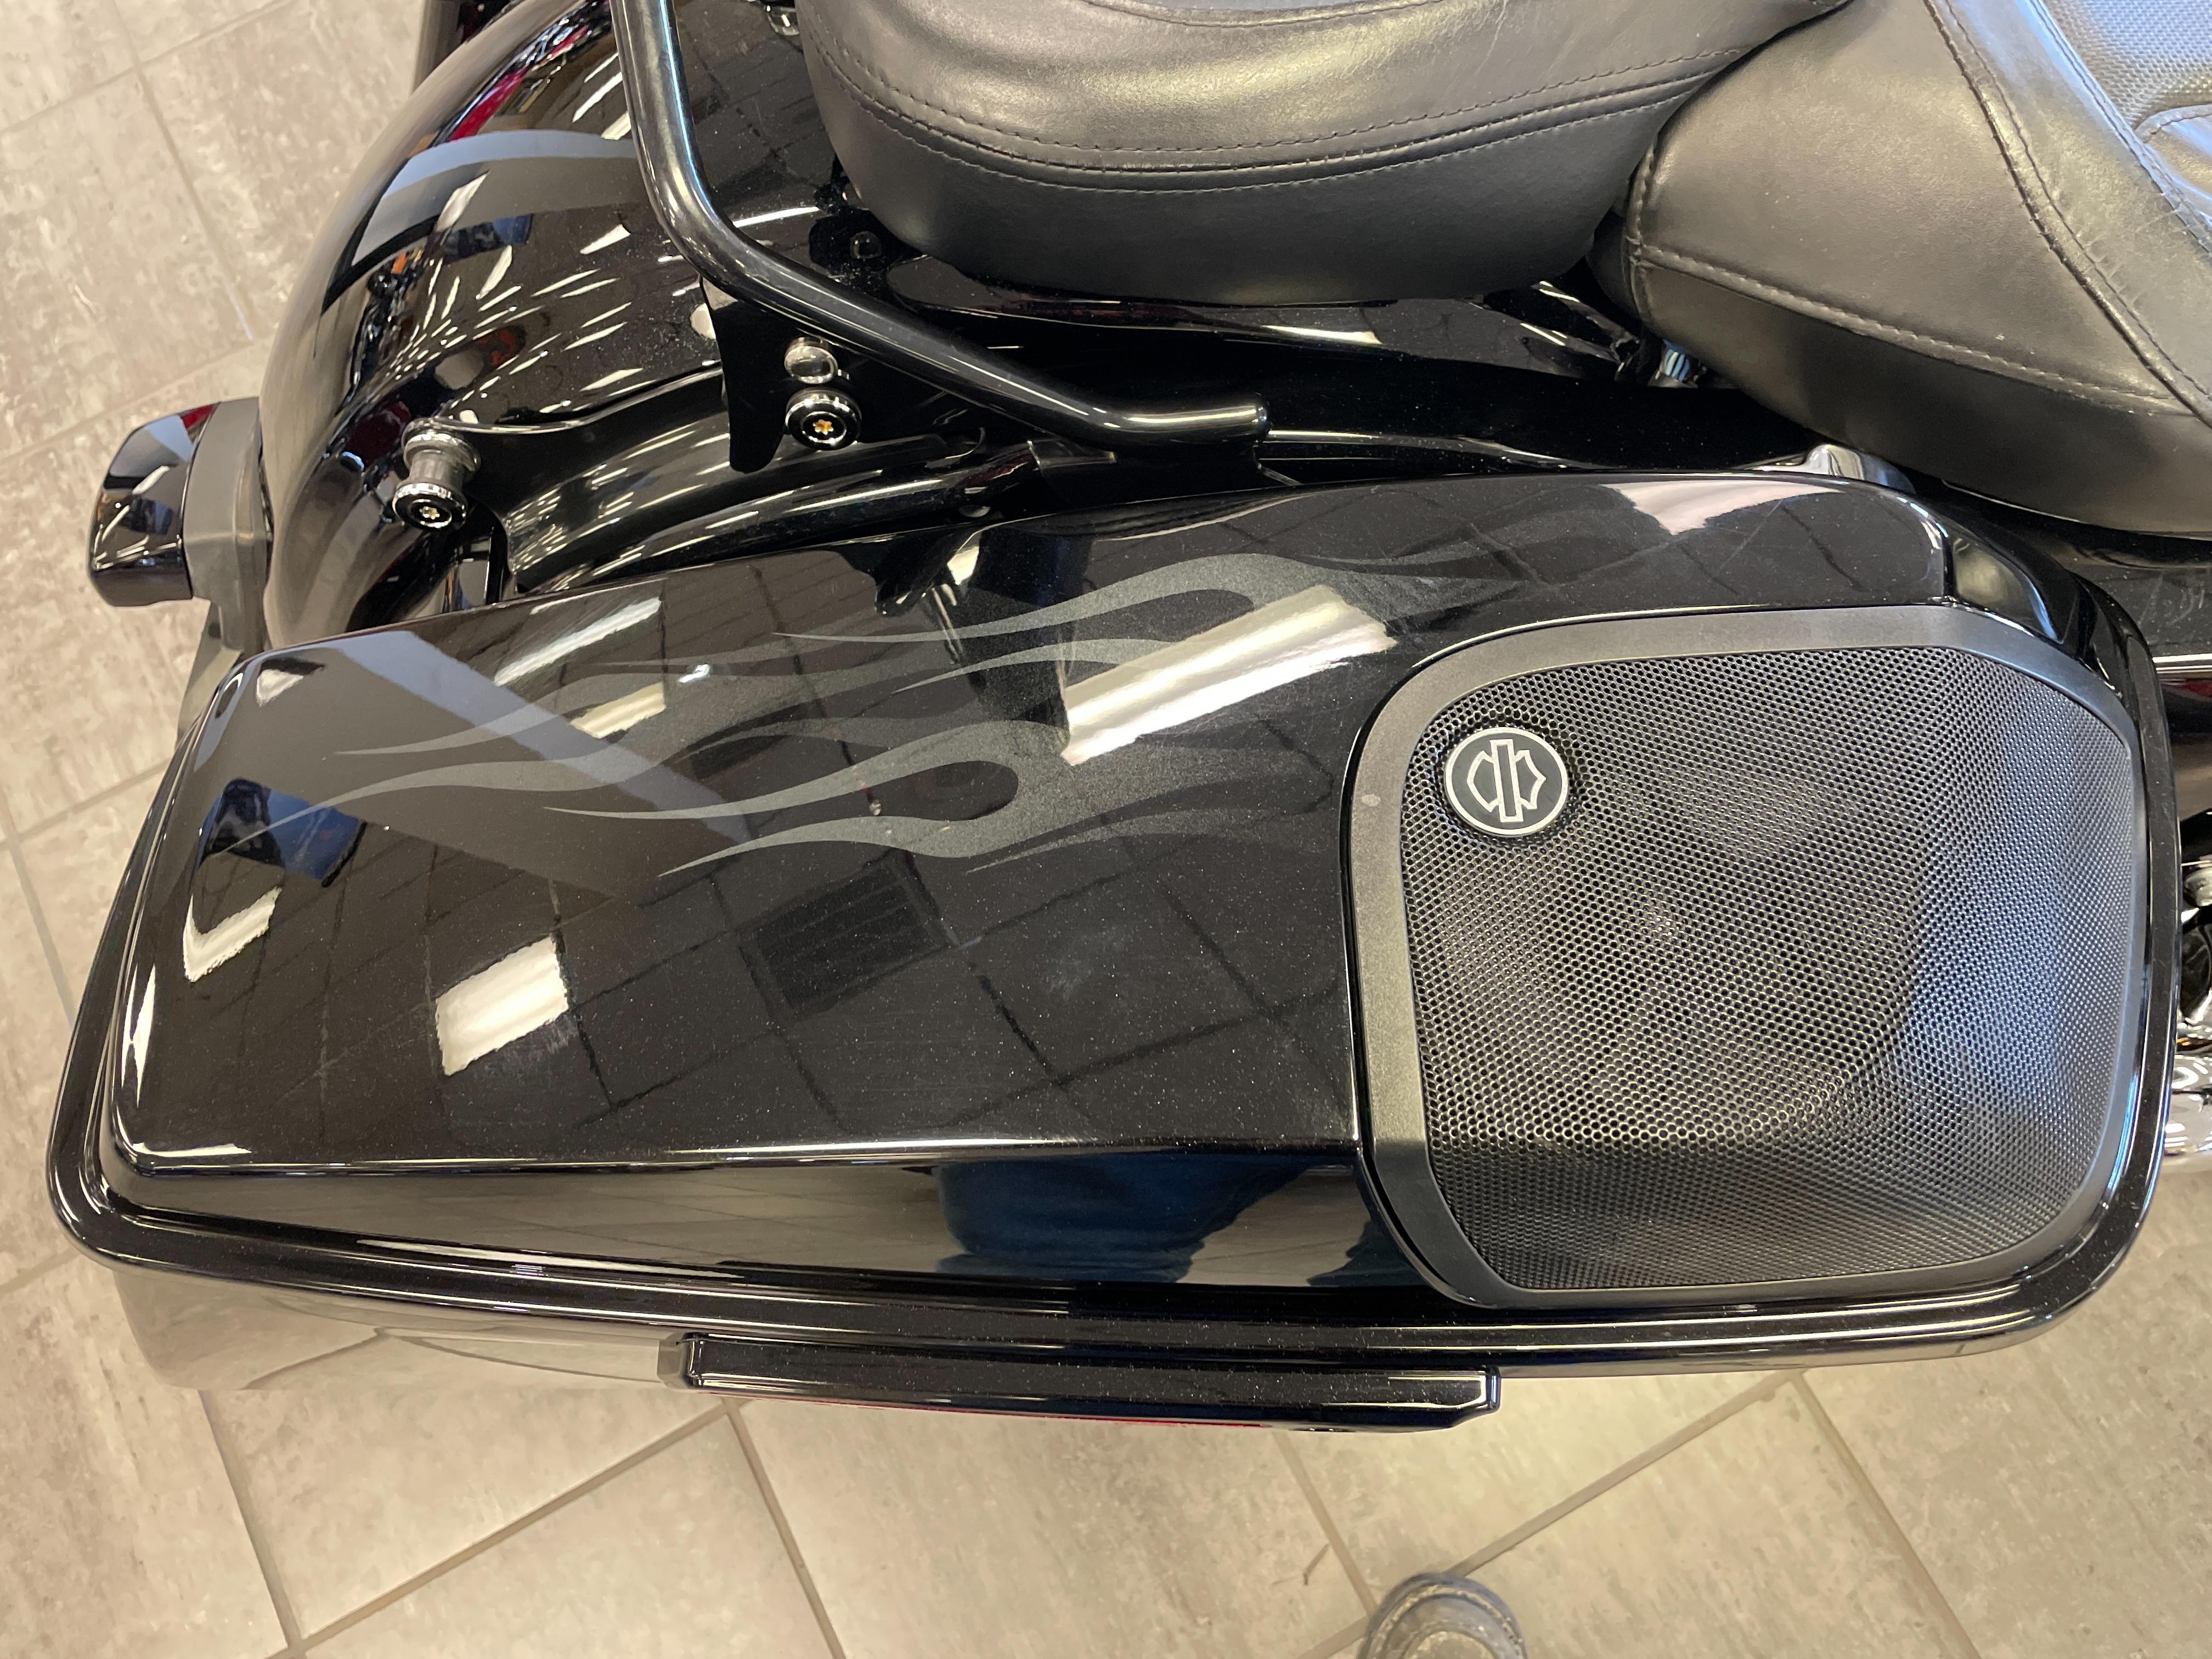 2015 Harley-Davidson Street Glide CVO Street Glide at Tripp's Harley-Davidson